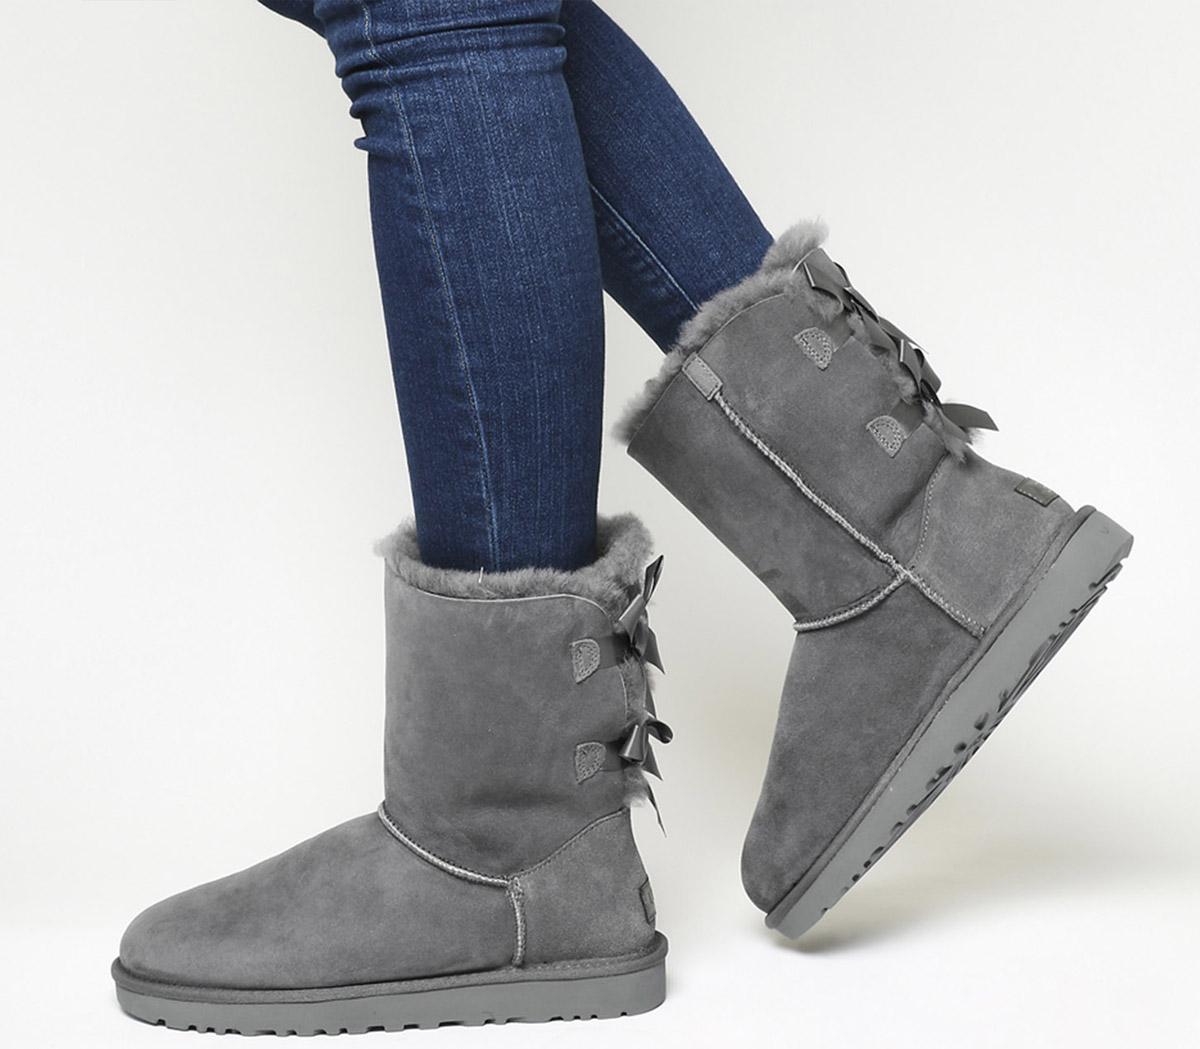 Womens Ugg Bailey Bow Ii Calf Boot Black Suede Uk Size 6.5